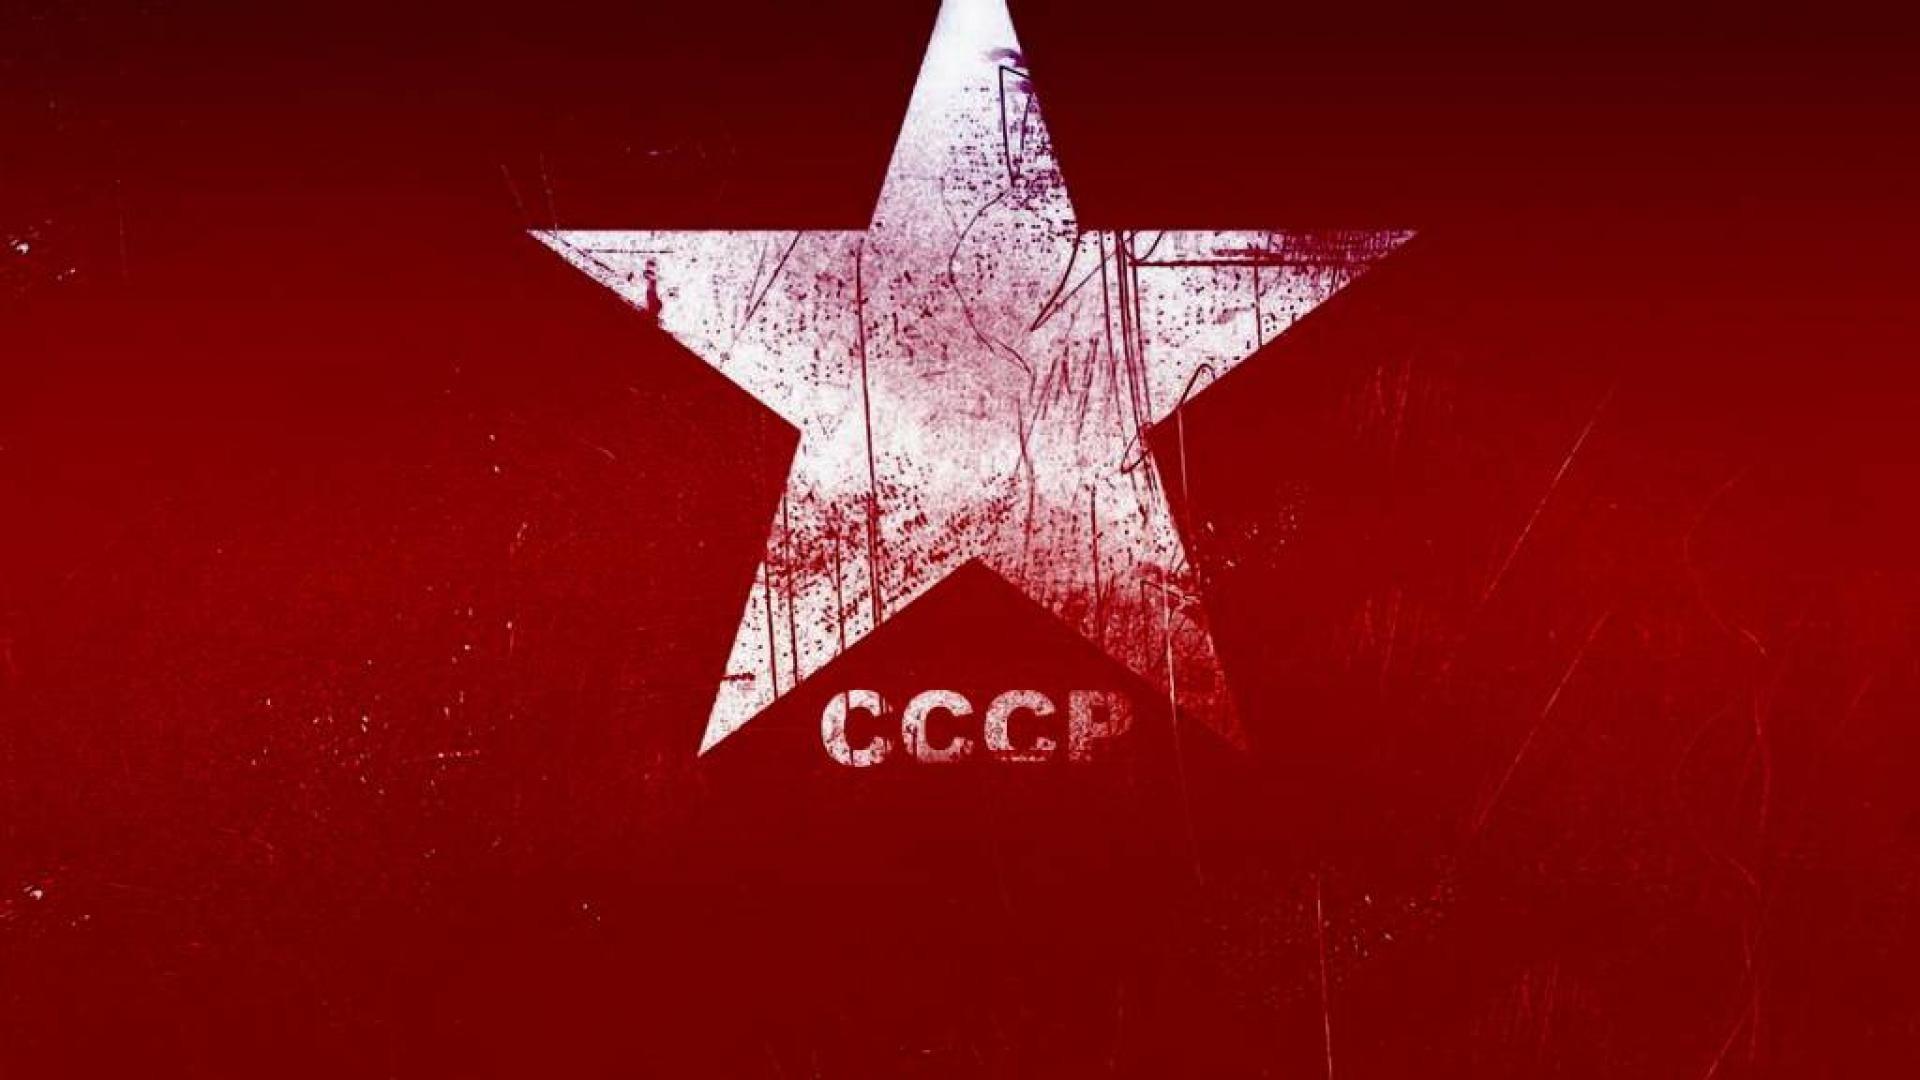 Cccp wallpaper 1920x1080